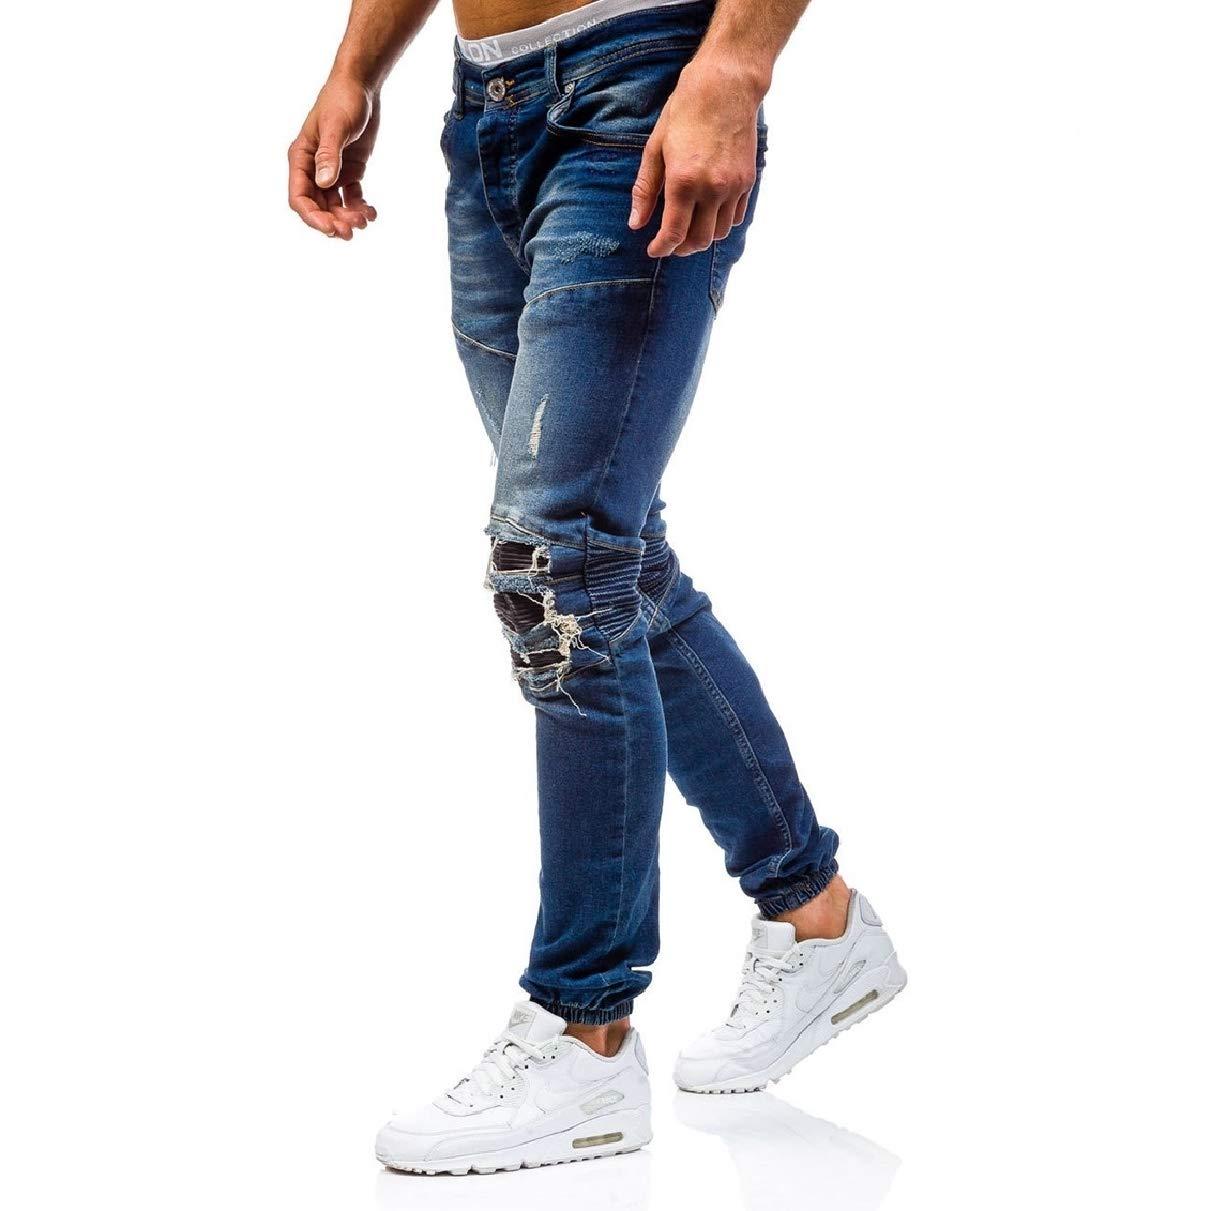 Coolred-Men Slimming Plus Size Wash Comfort Jeans Regular-Fit Pants